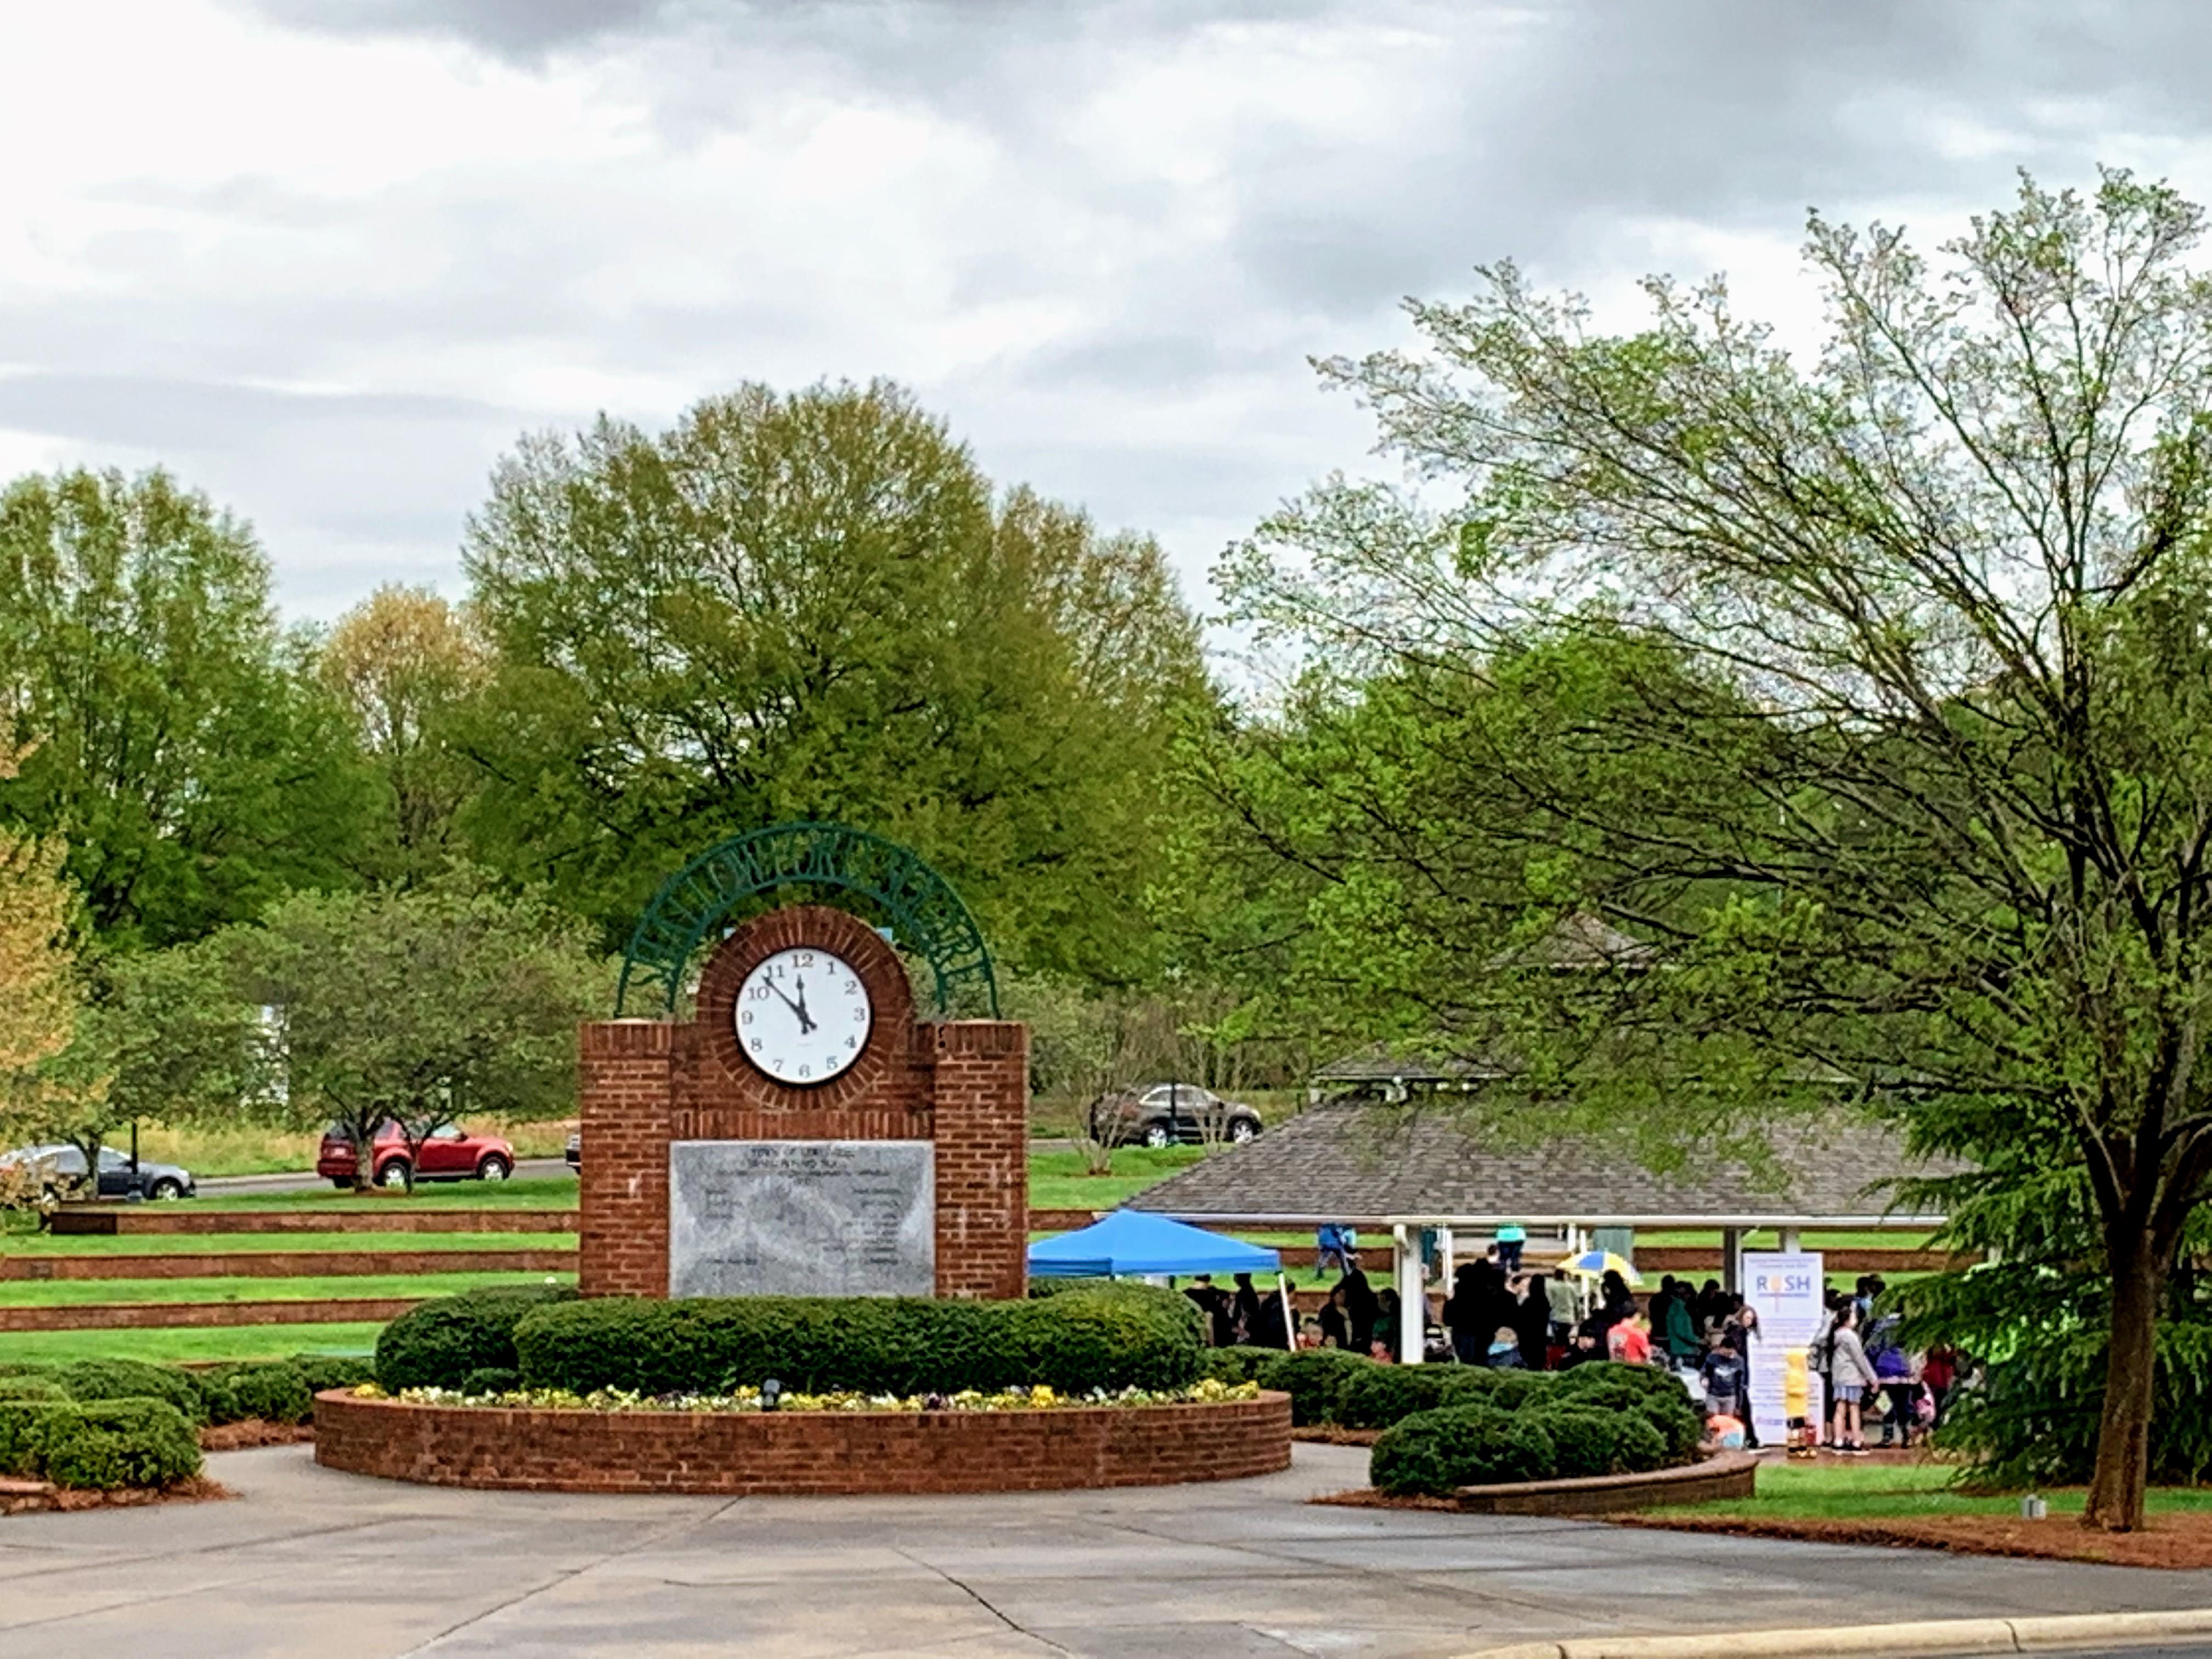 Shallowford Square, Lewisville, NC